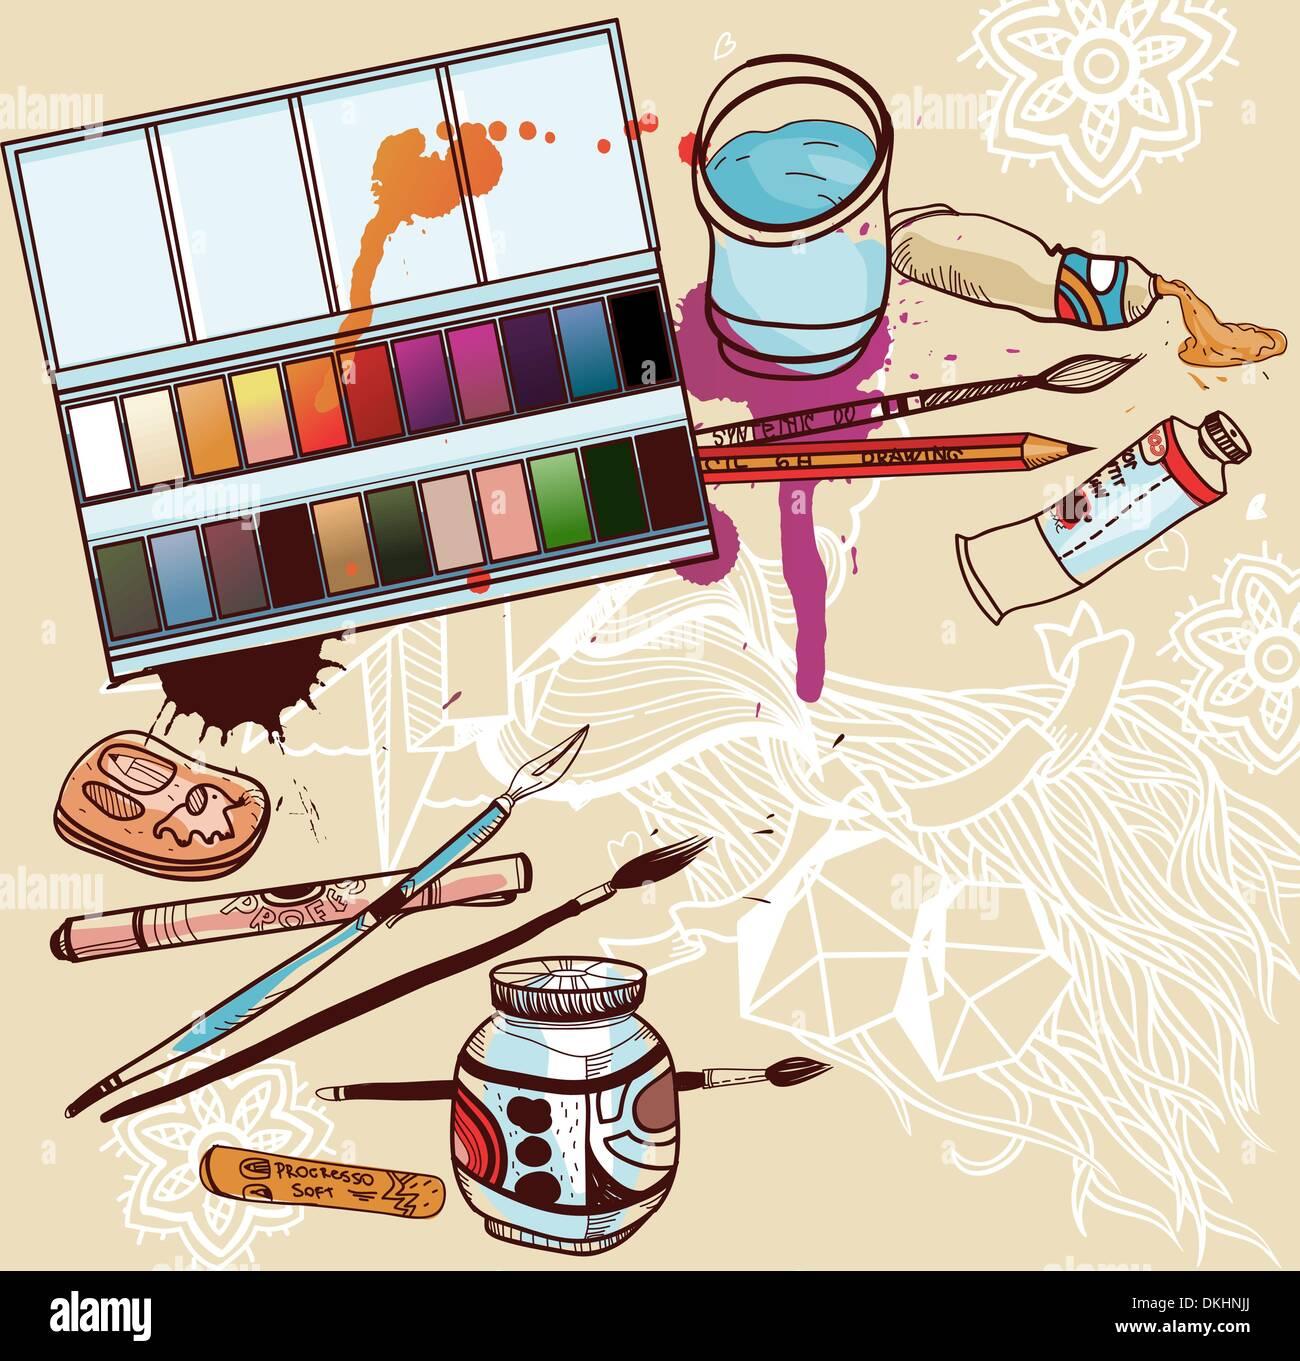 Vektor-Illustration künstlerische Werkzeuge Stockbild